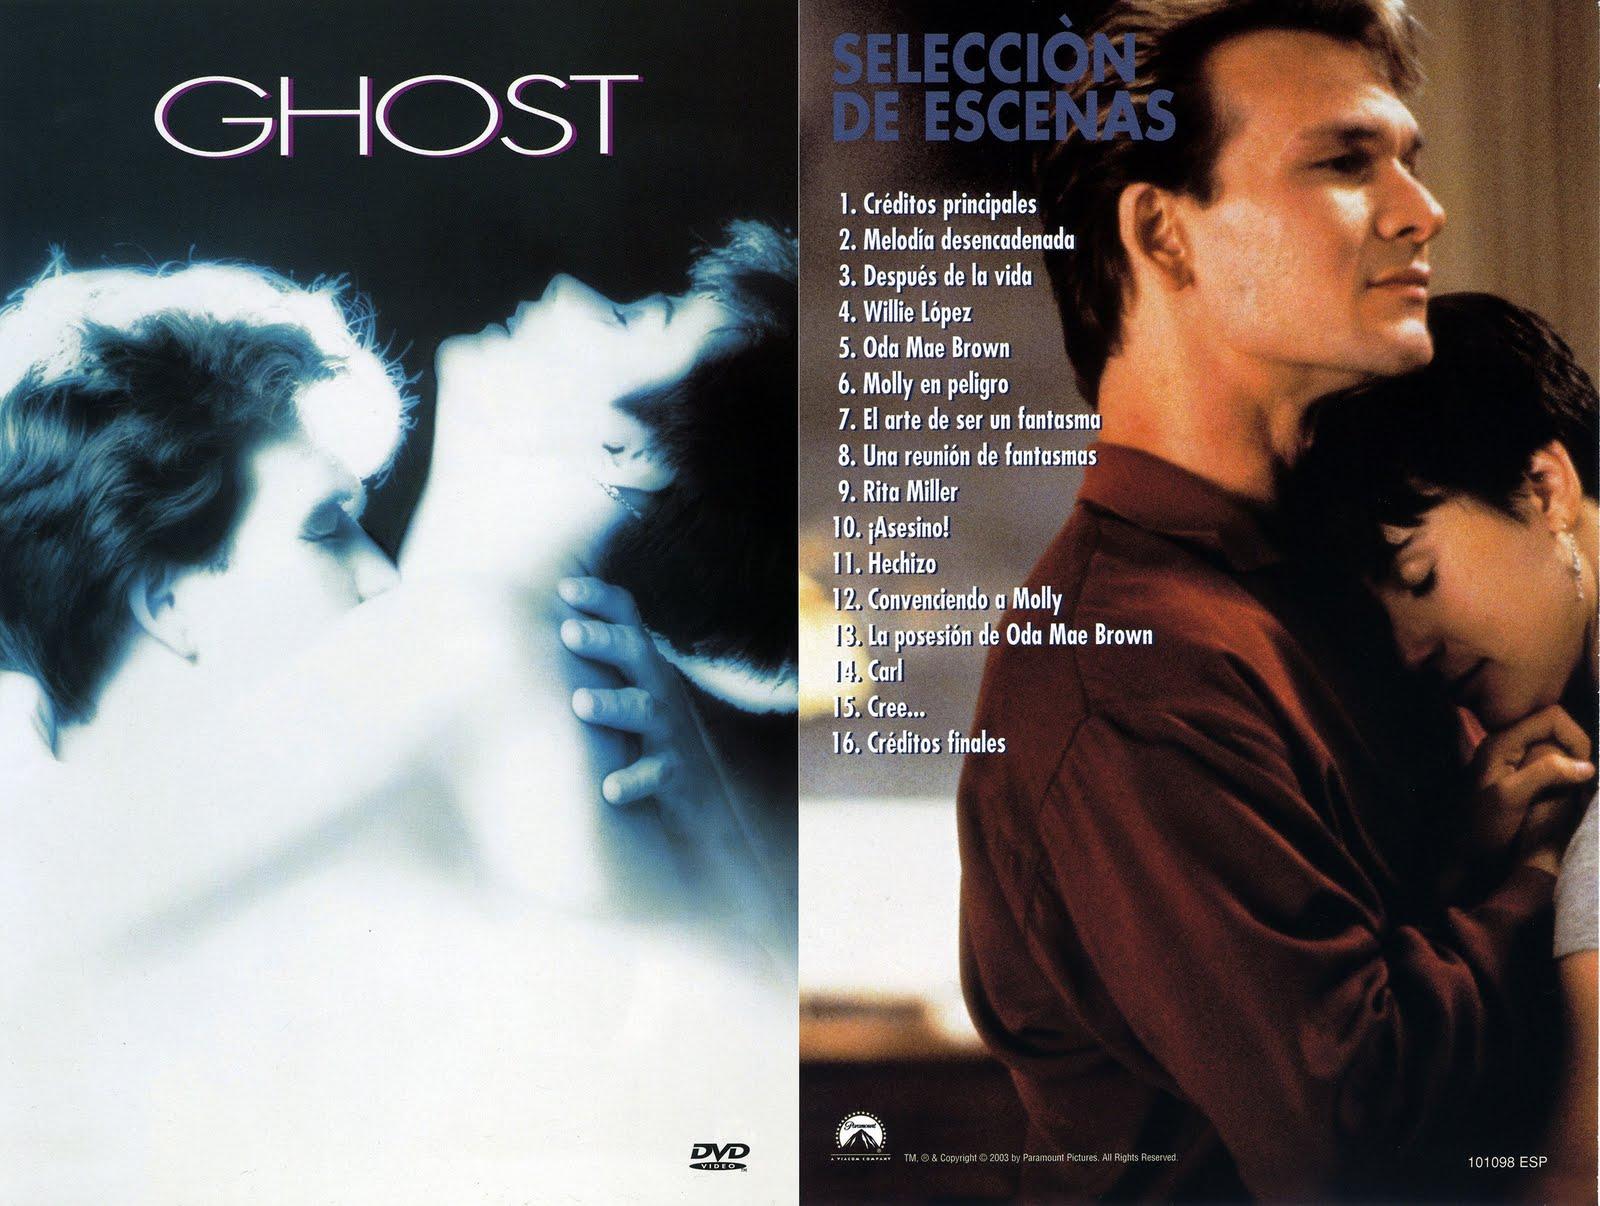 http://4.bp.blogspot.com/_FN7dlH54yBQ/S_oJQaPKwDI/AAAAAAAACrc/6ZuASiT0O_A/s1600/Ghost++Inlay.jpg